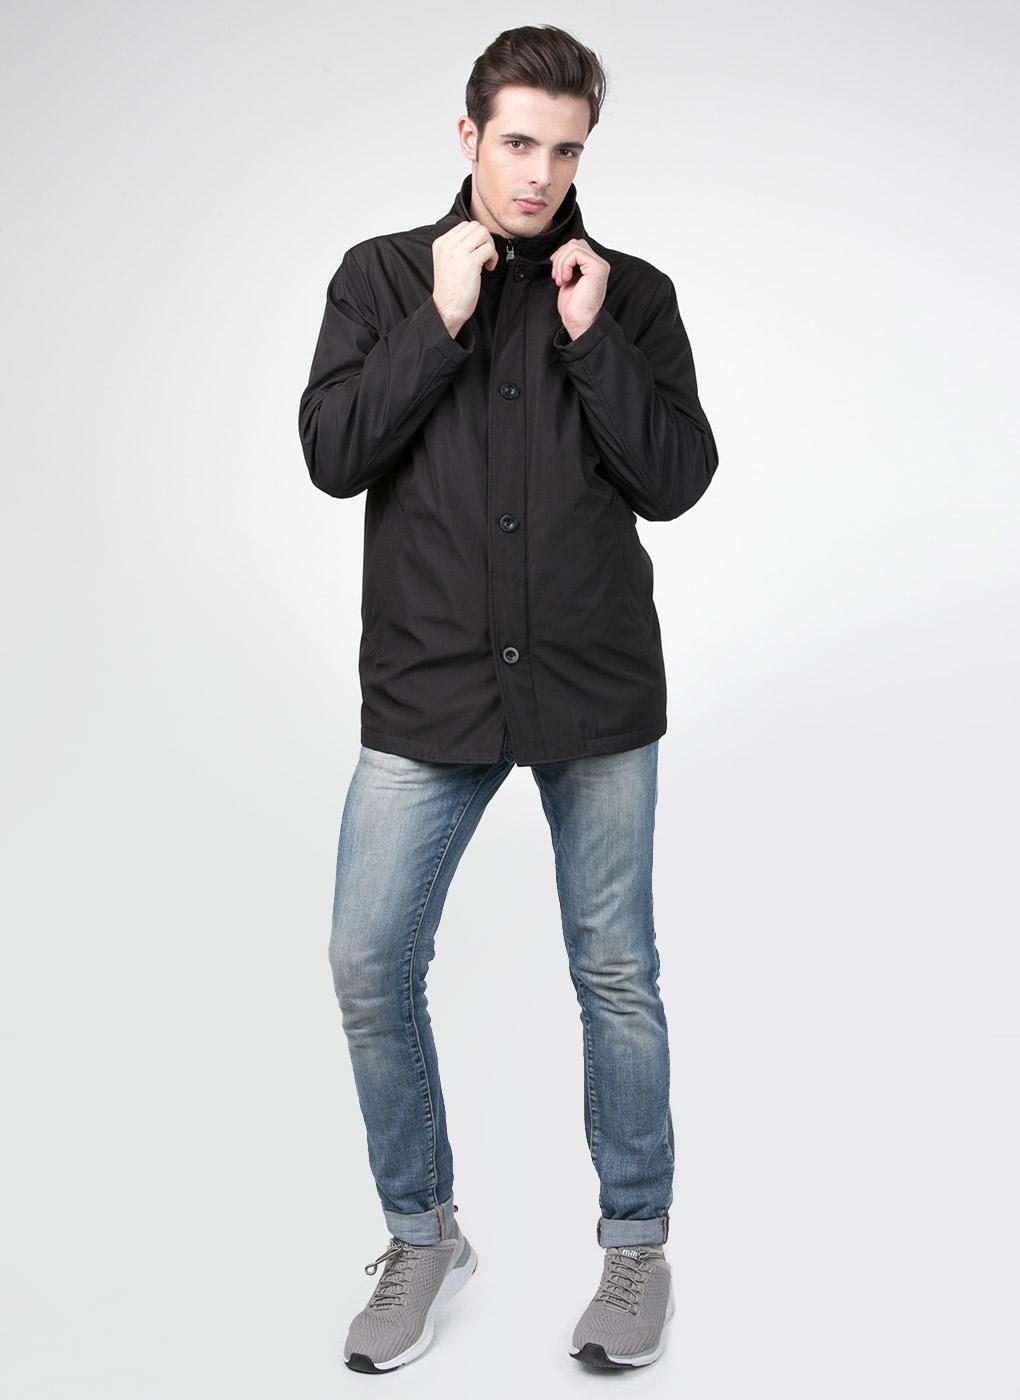 Куртка мужская утепленная 42, Milton фото